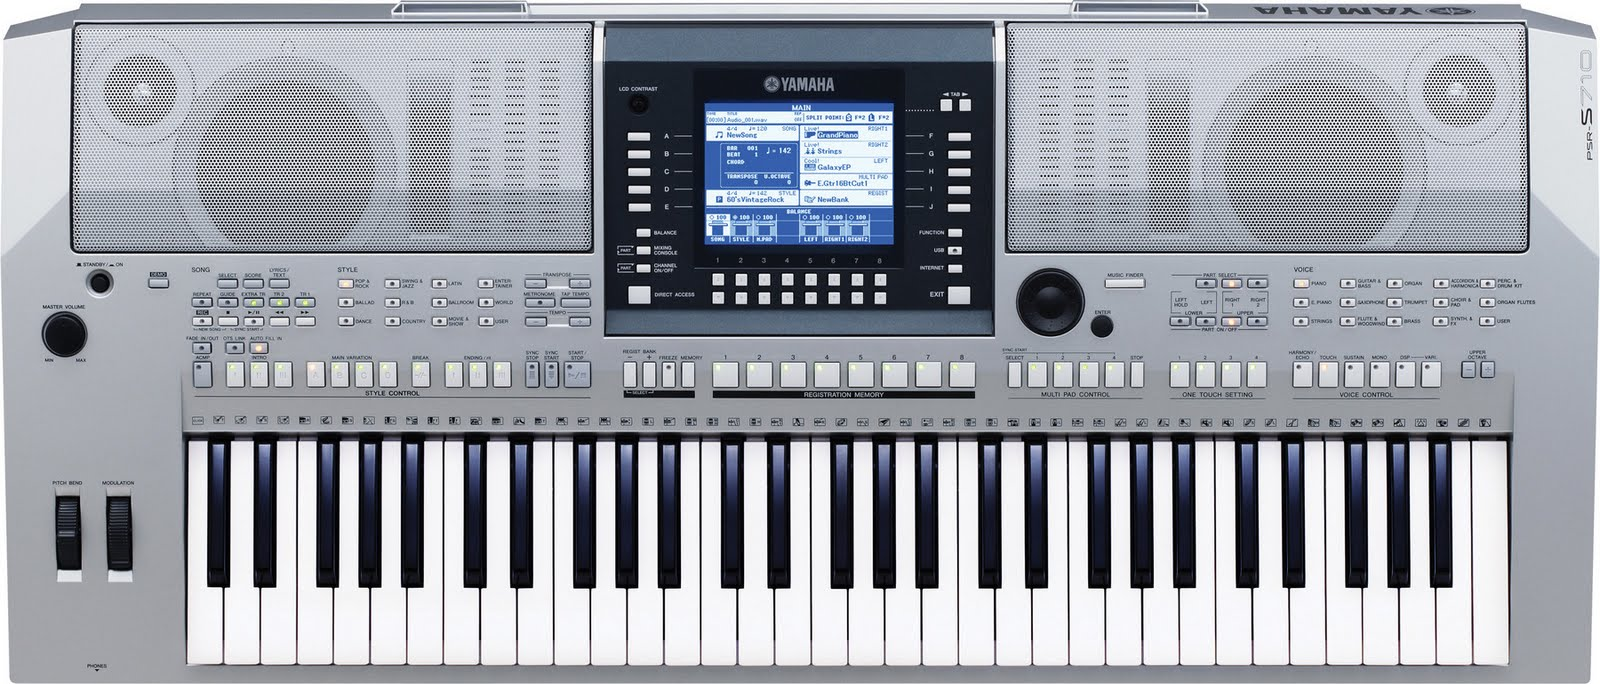 Yamaha Psr S710 : allans billy hyde yamaha psr s710 keyboard ~ Jslefanu.com Haus und Dekorationen